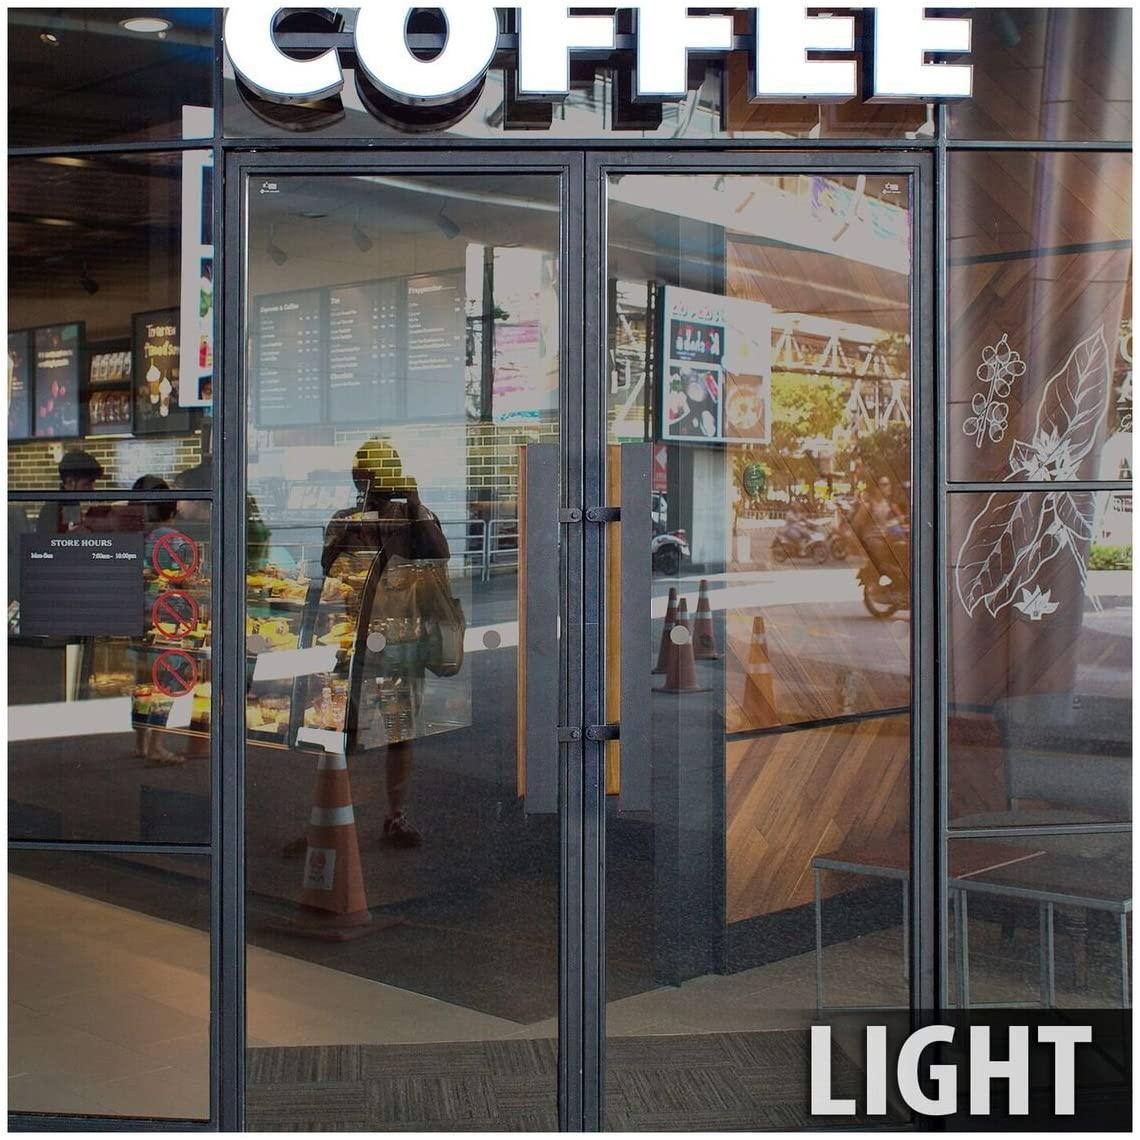 BDF BRZ50 Window Film Bronze Sun and Heat Control (Light) - 60in X 50ft